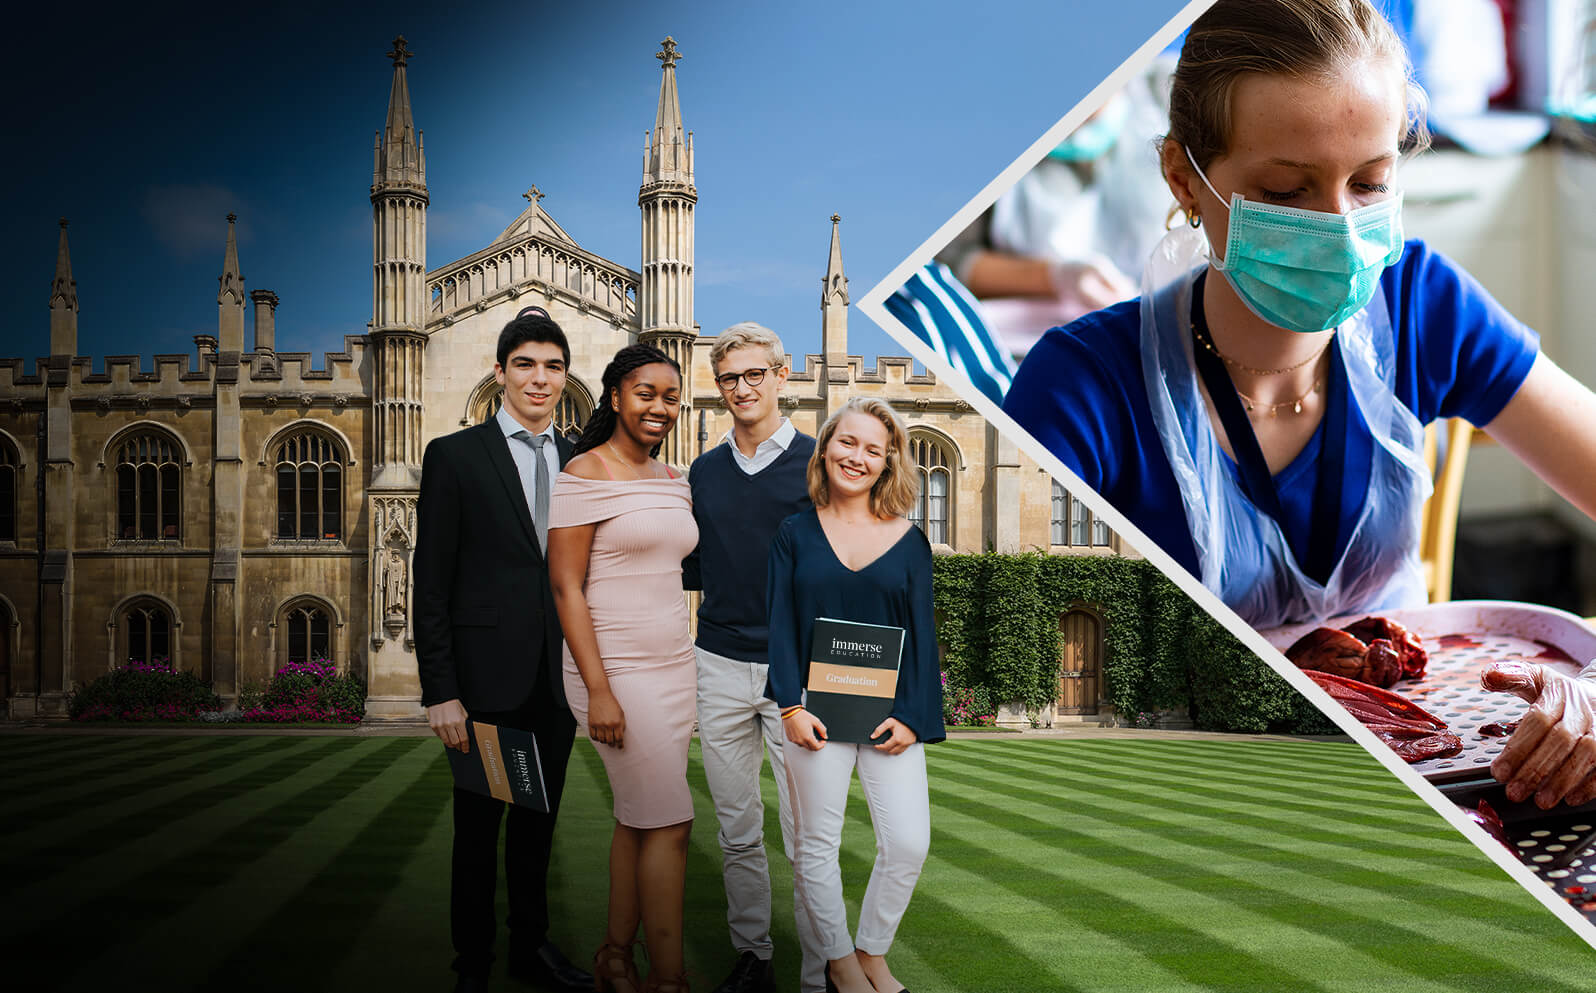 Cambridge Medicine Summer Program for Ages 16-18